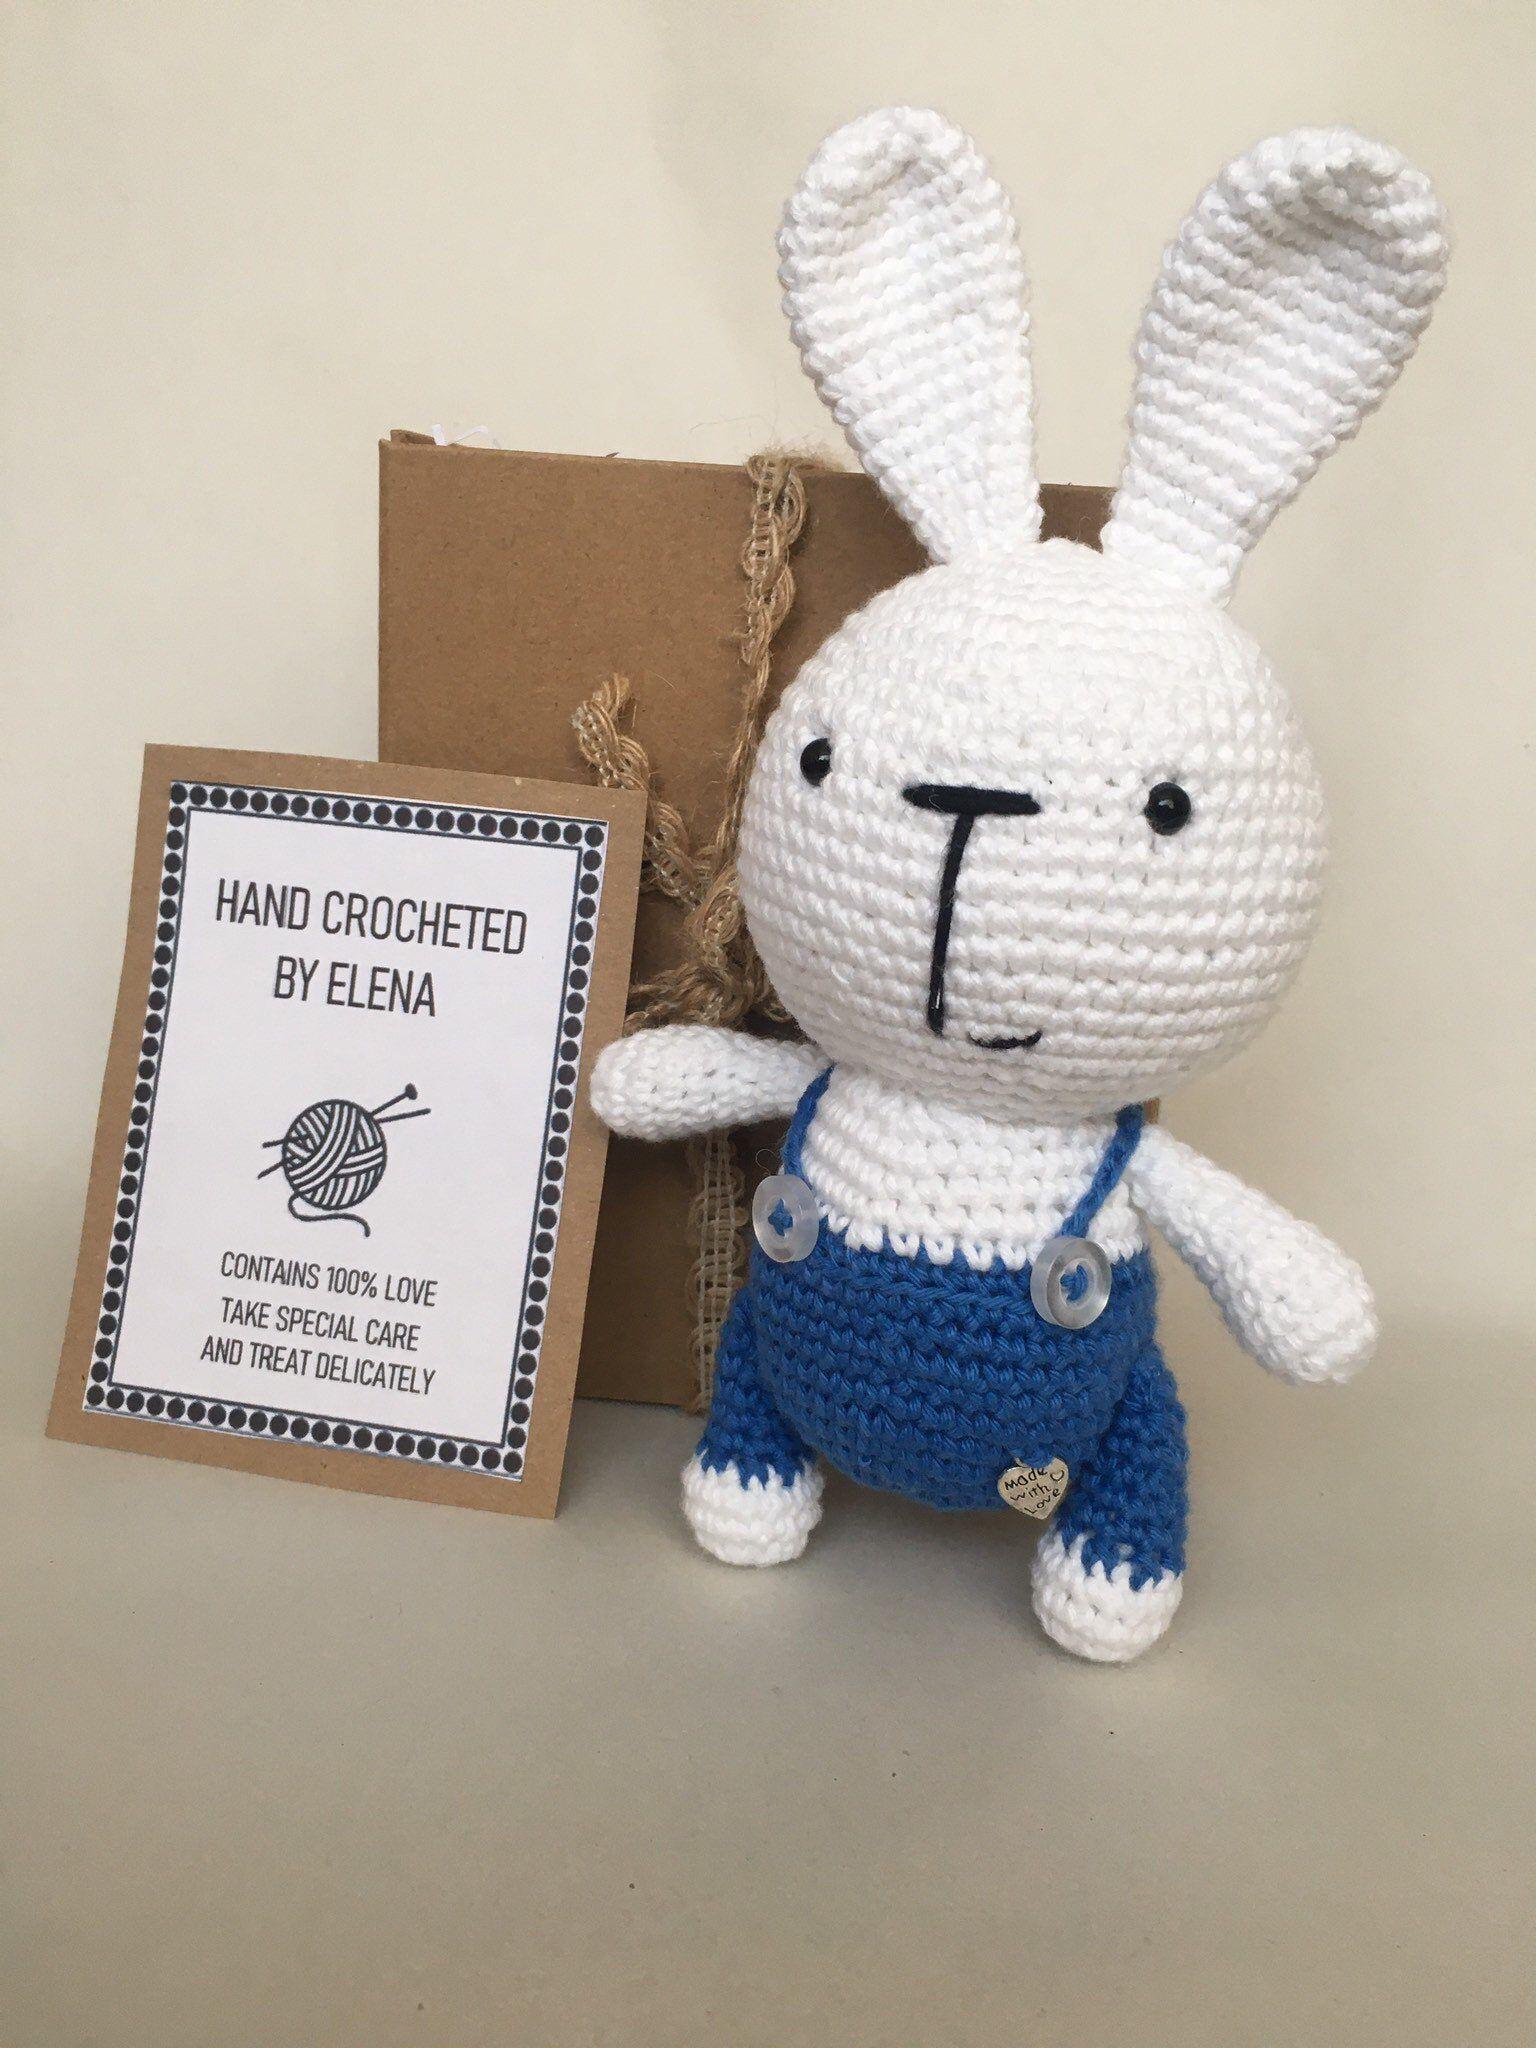 Crochet little bunny stuffed toy gift homemade decor